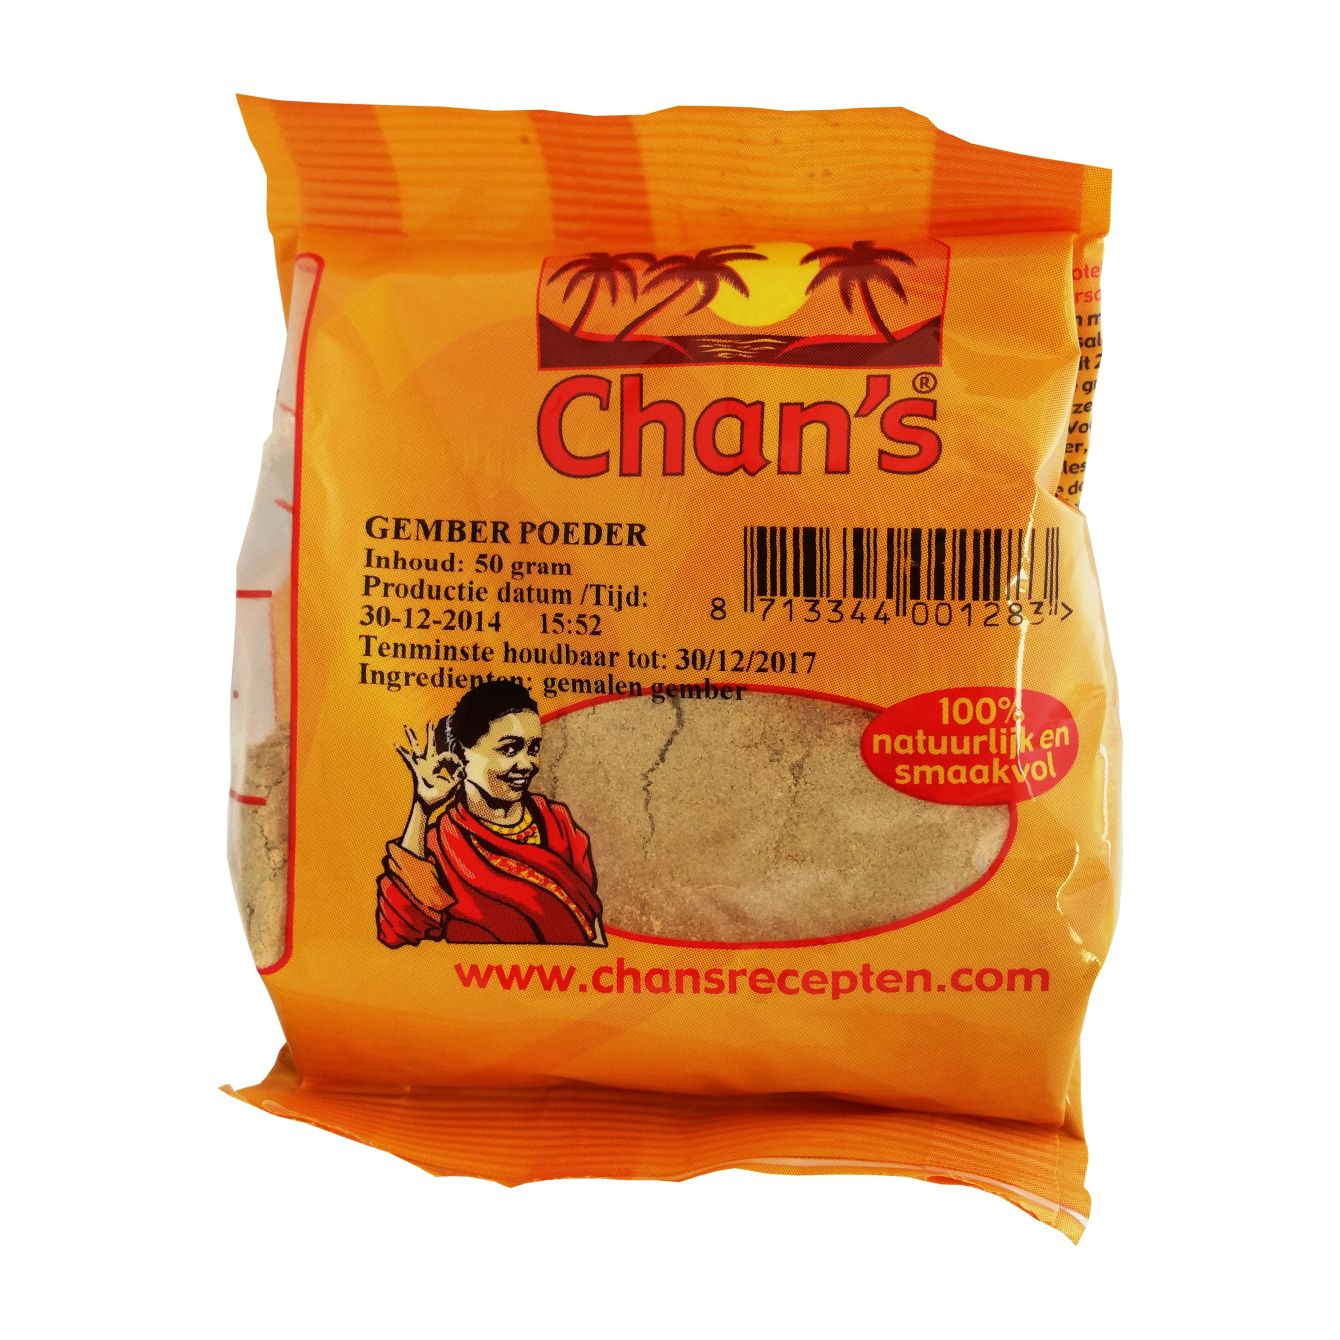 Chan's Gember Poeder